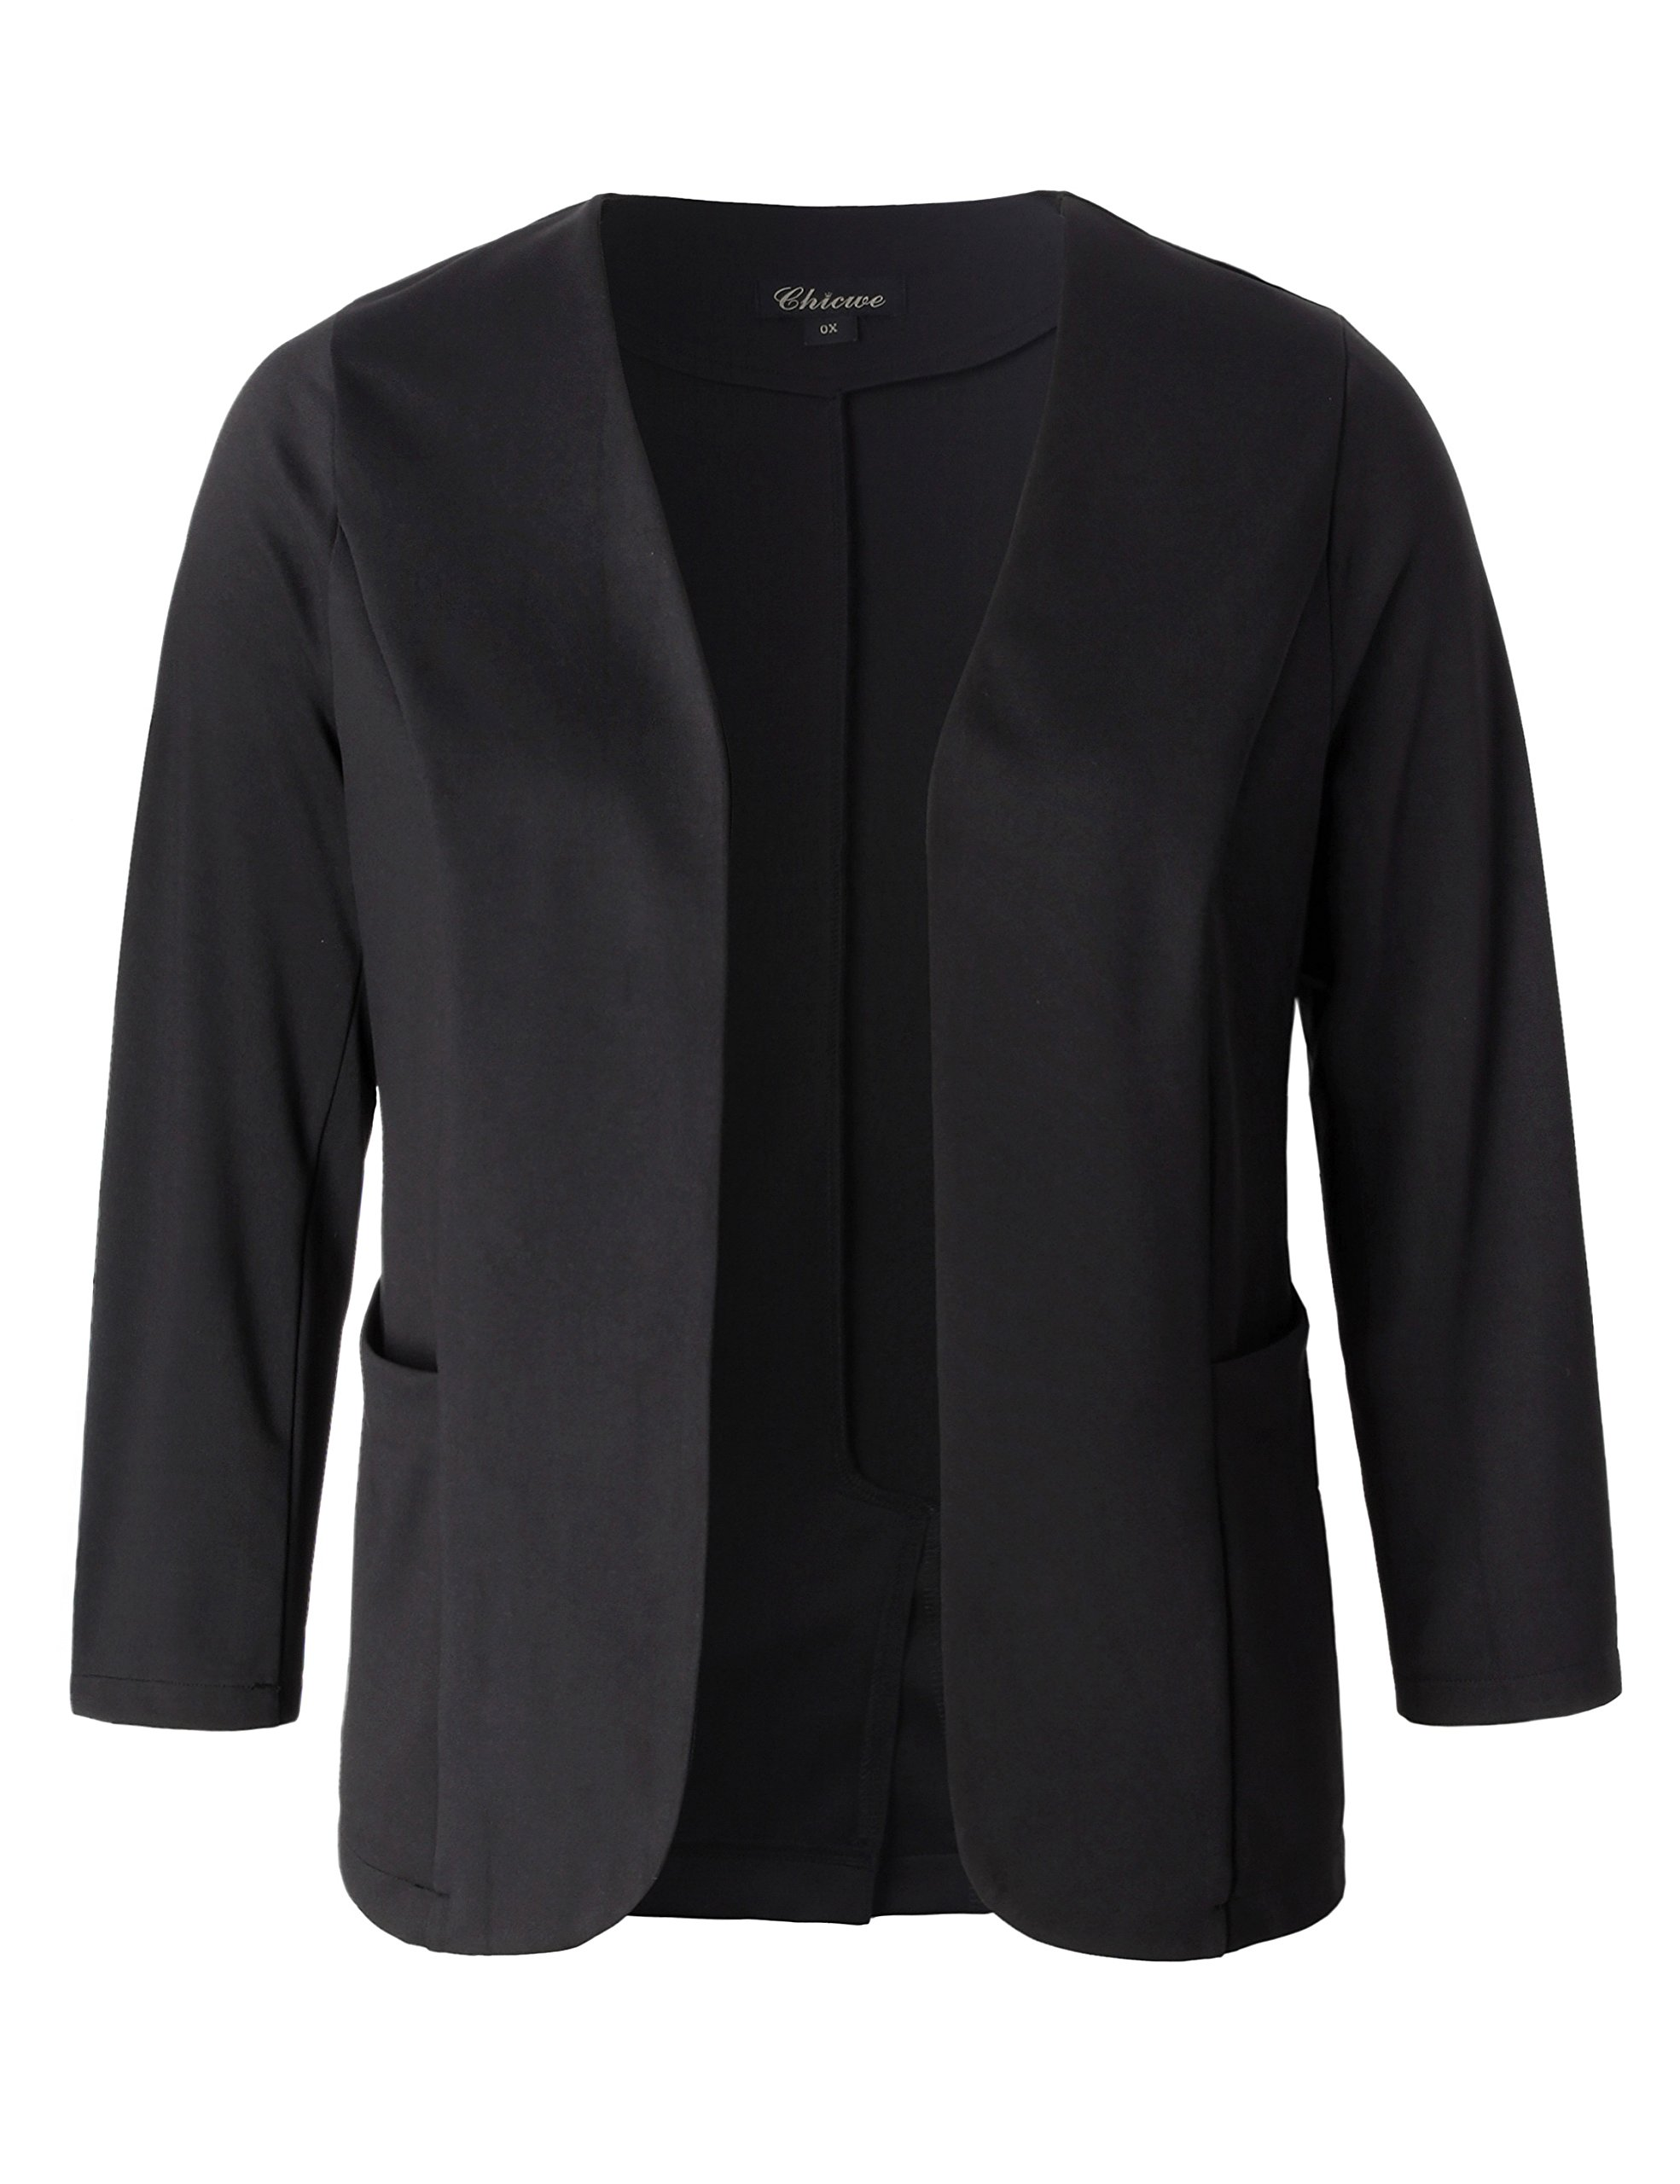 Chicwe Women's Stretch Work Chic Outfit Blazer Plus Size Jacket with Pockets Black 4X